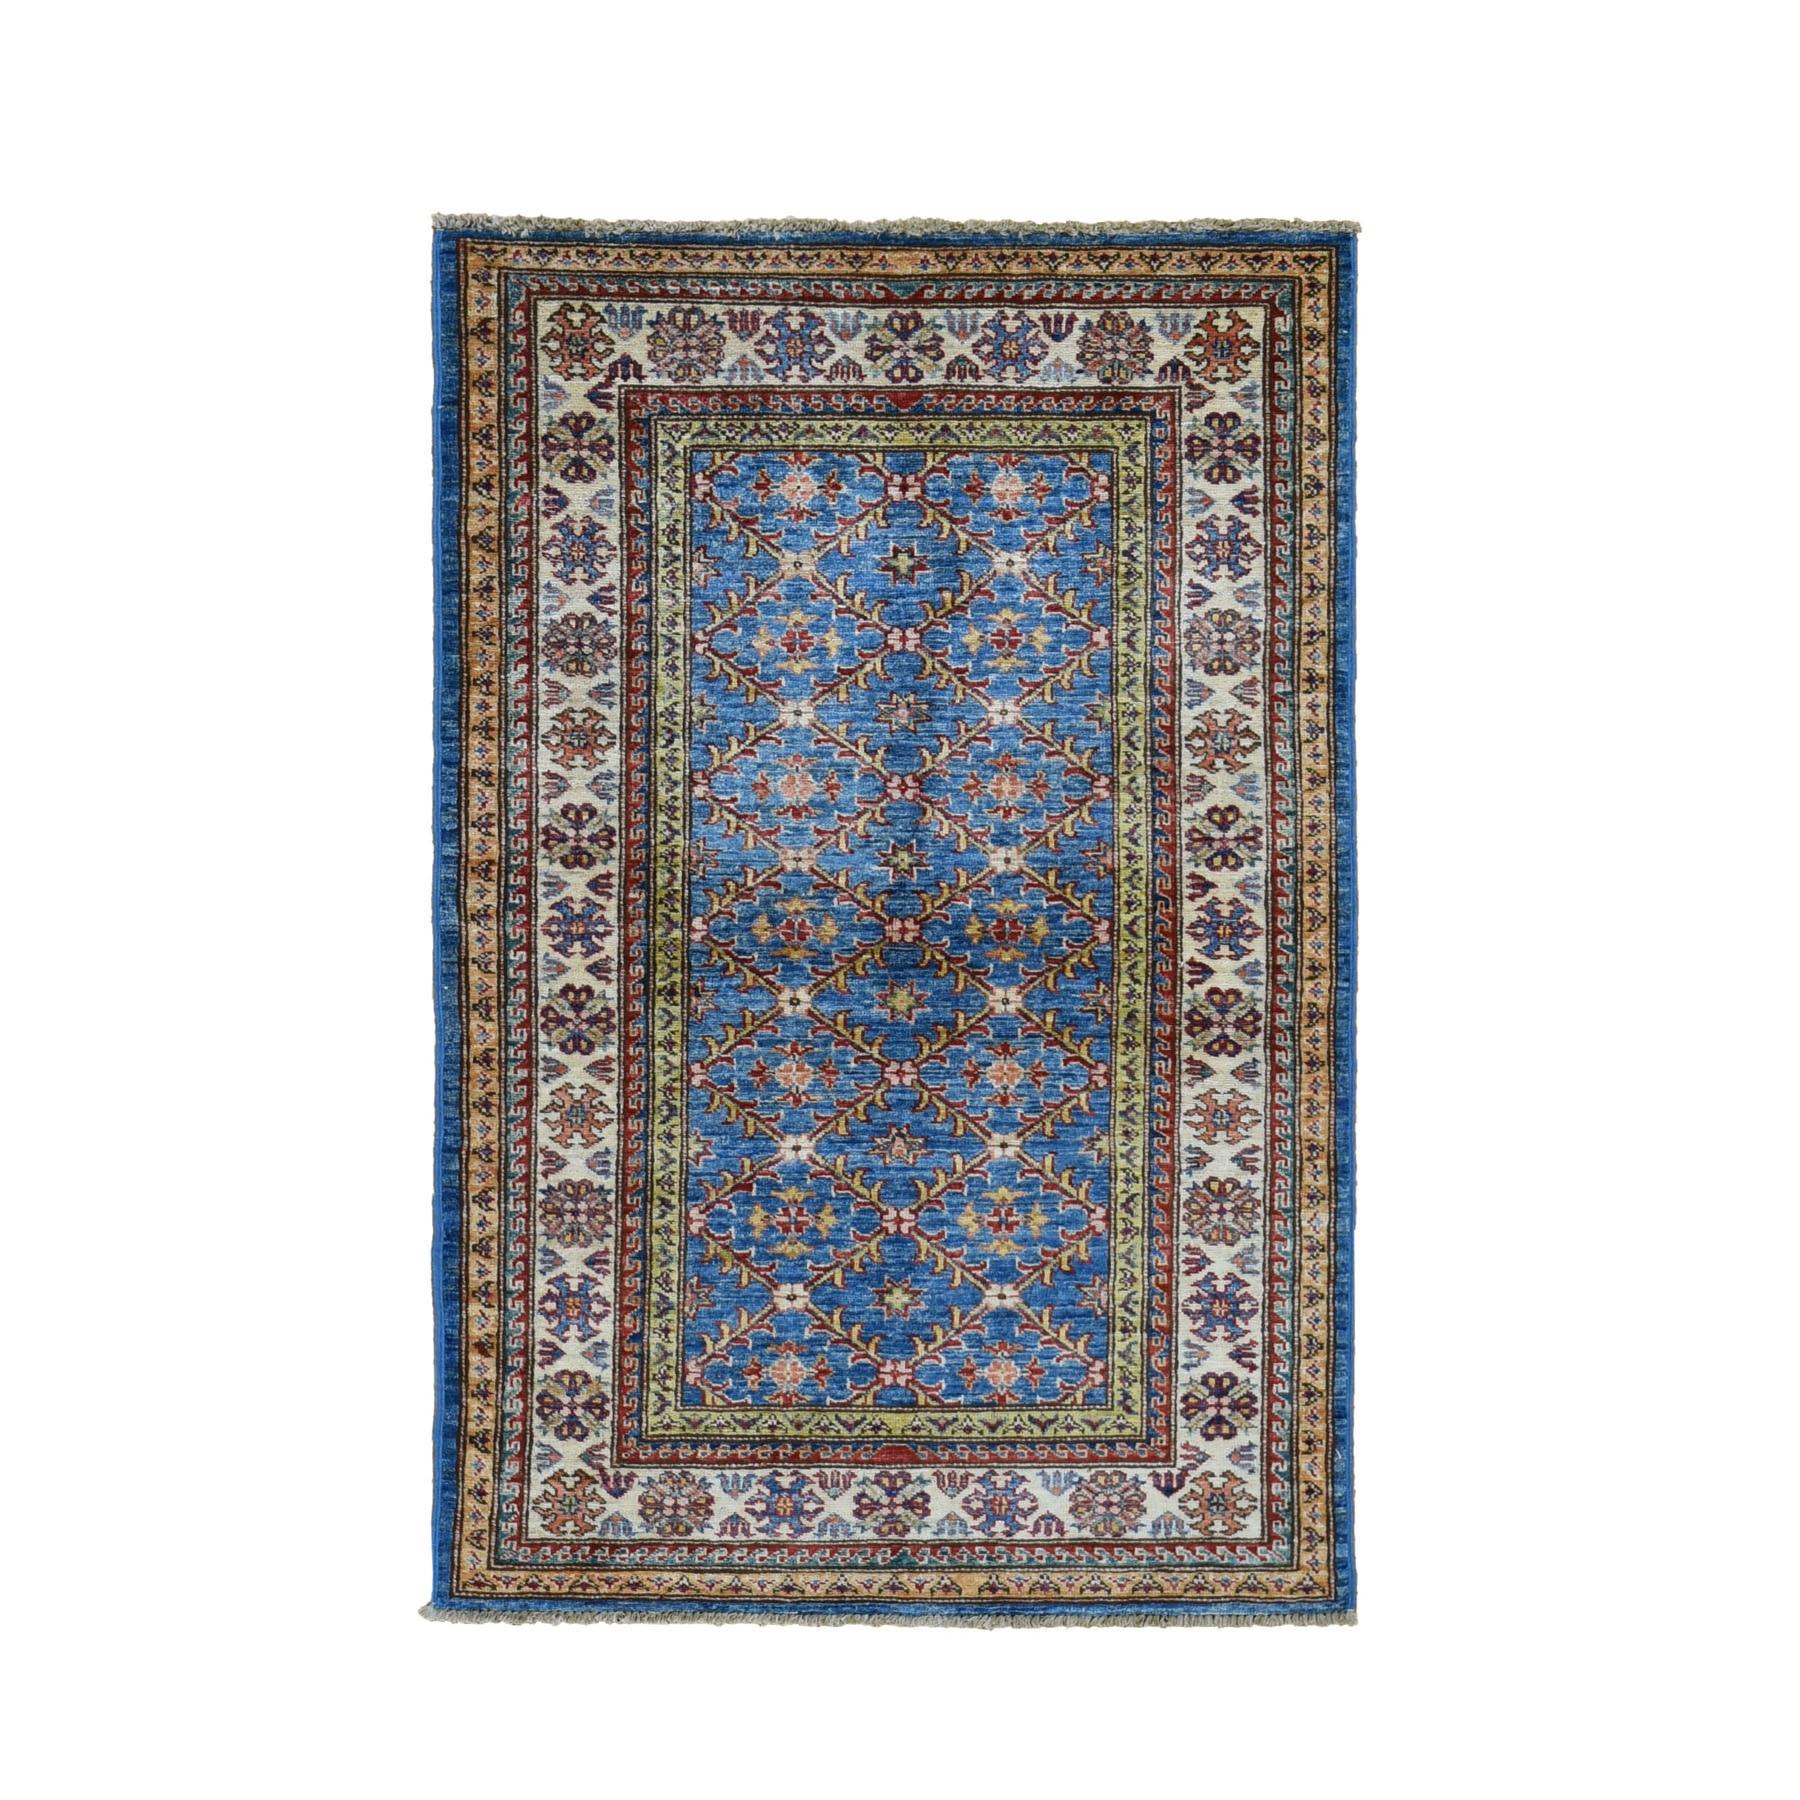 "3'3""X5' Blue Super Kazak Geometric Design Pure Wool Hand Knotted Oriental Rug moad7ae0"